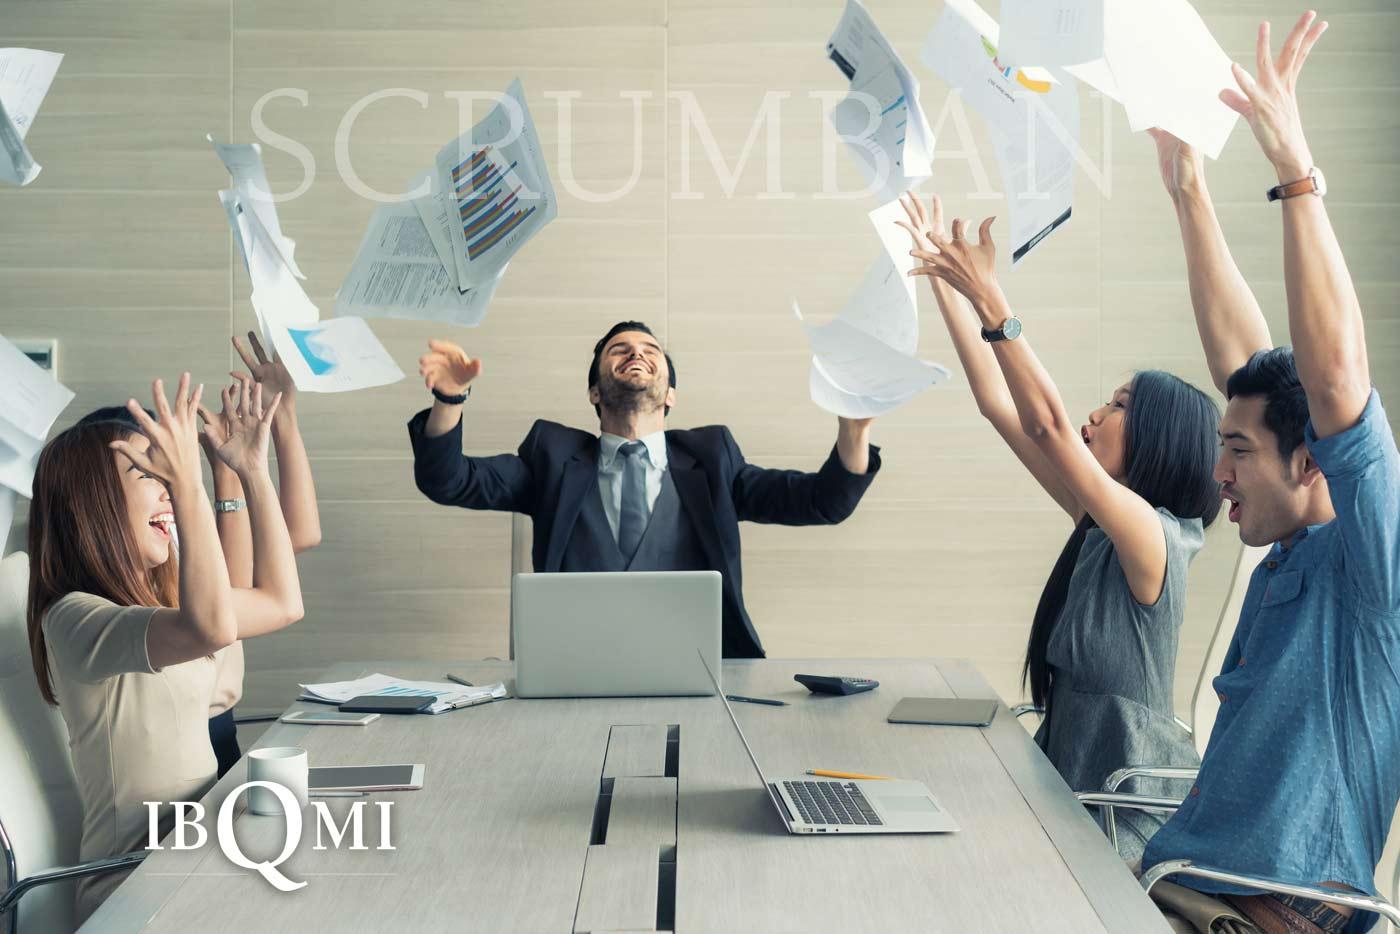 Benefits of scrumban